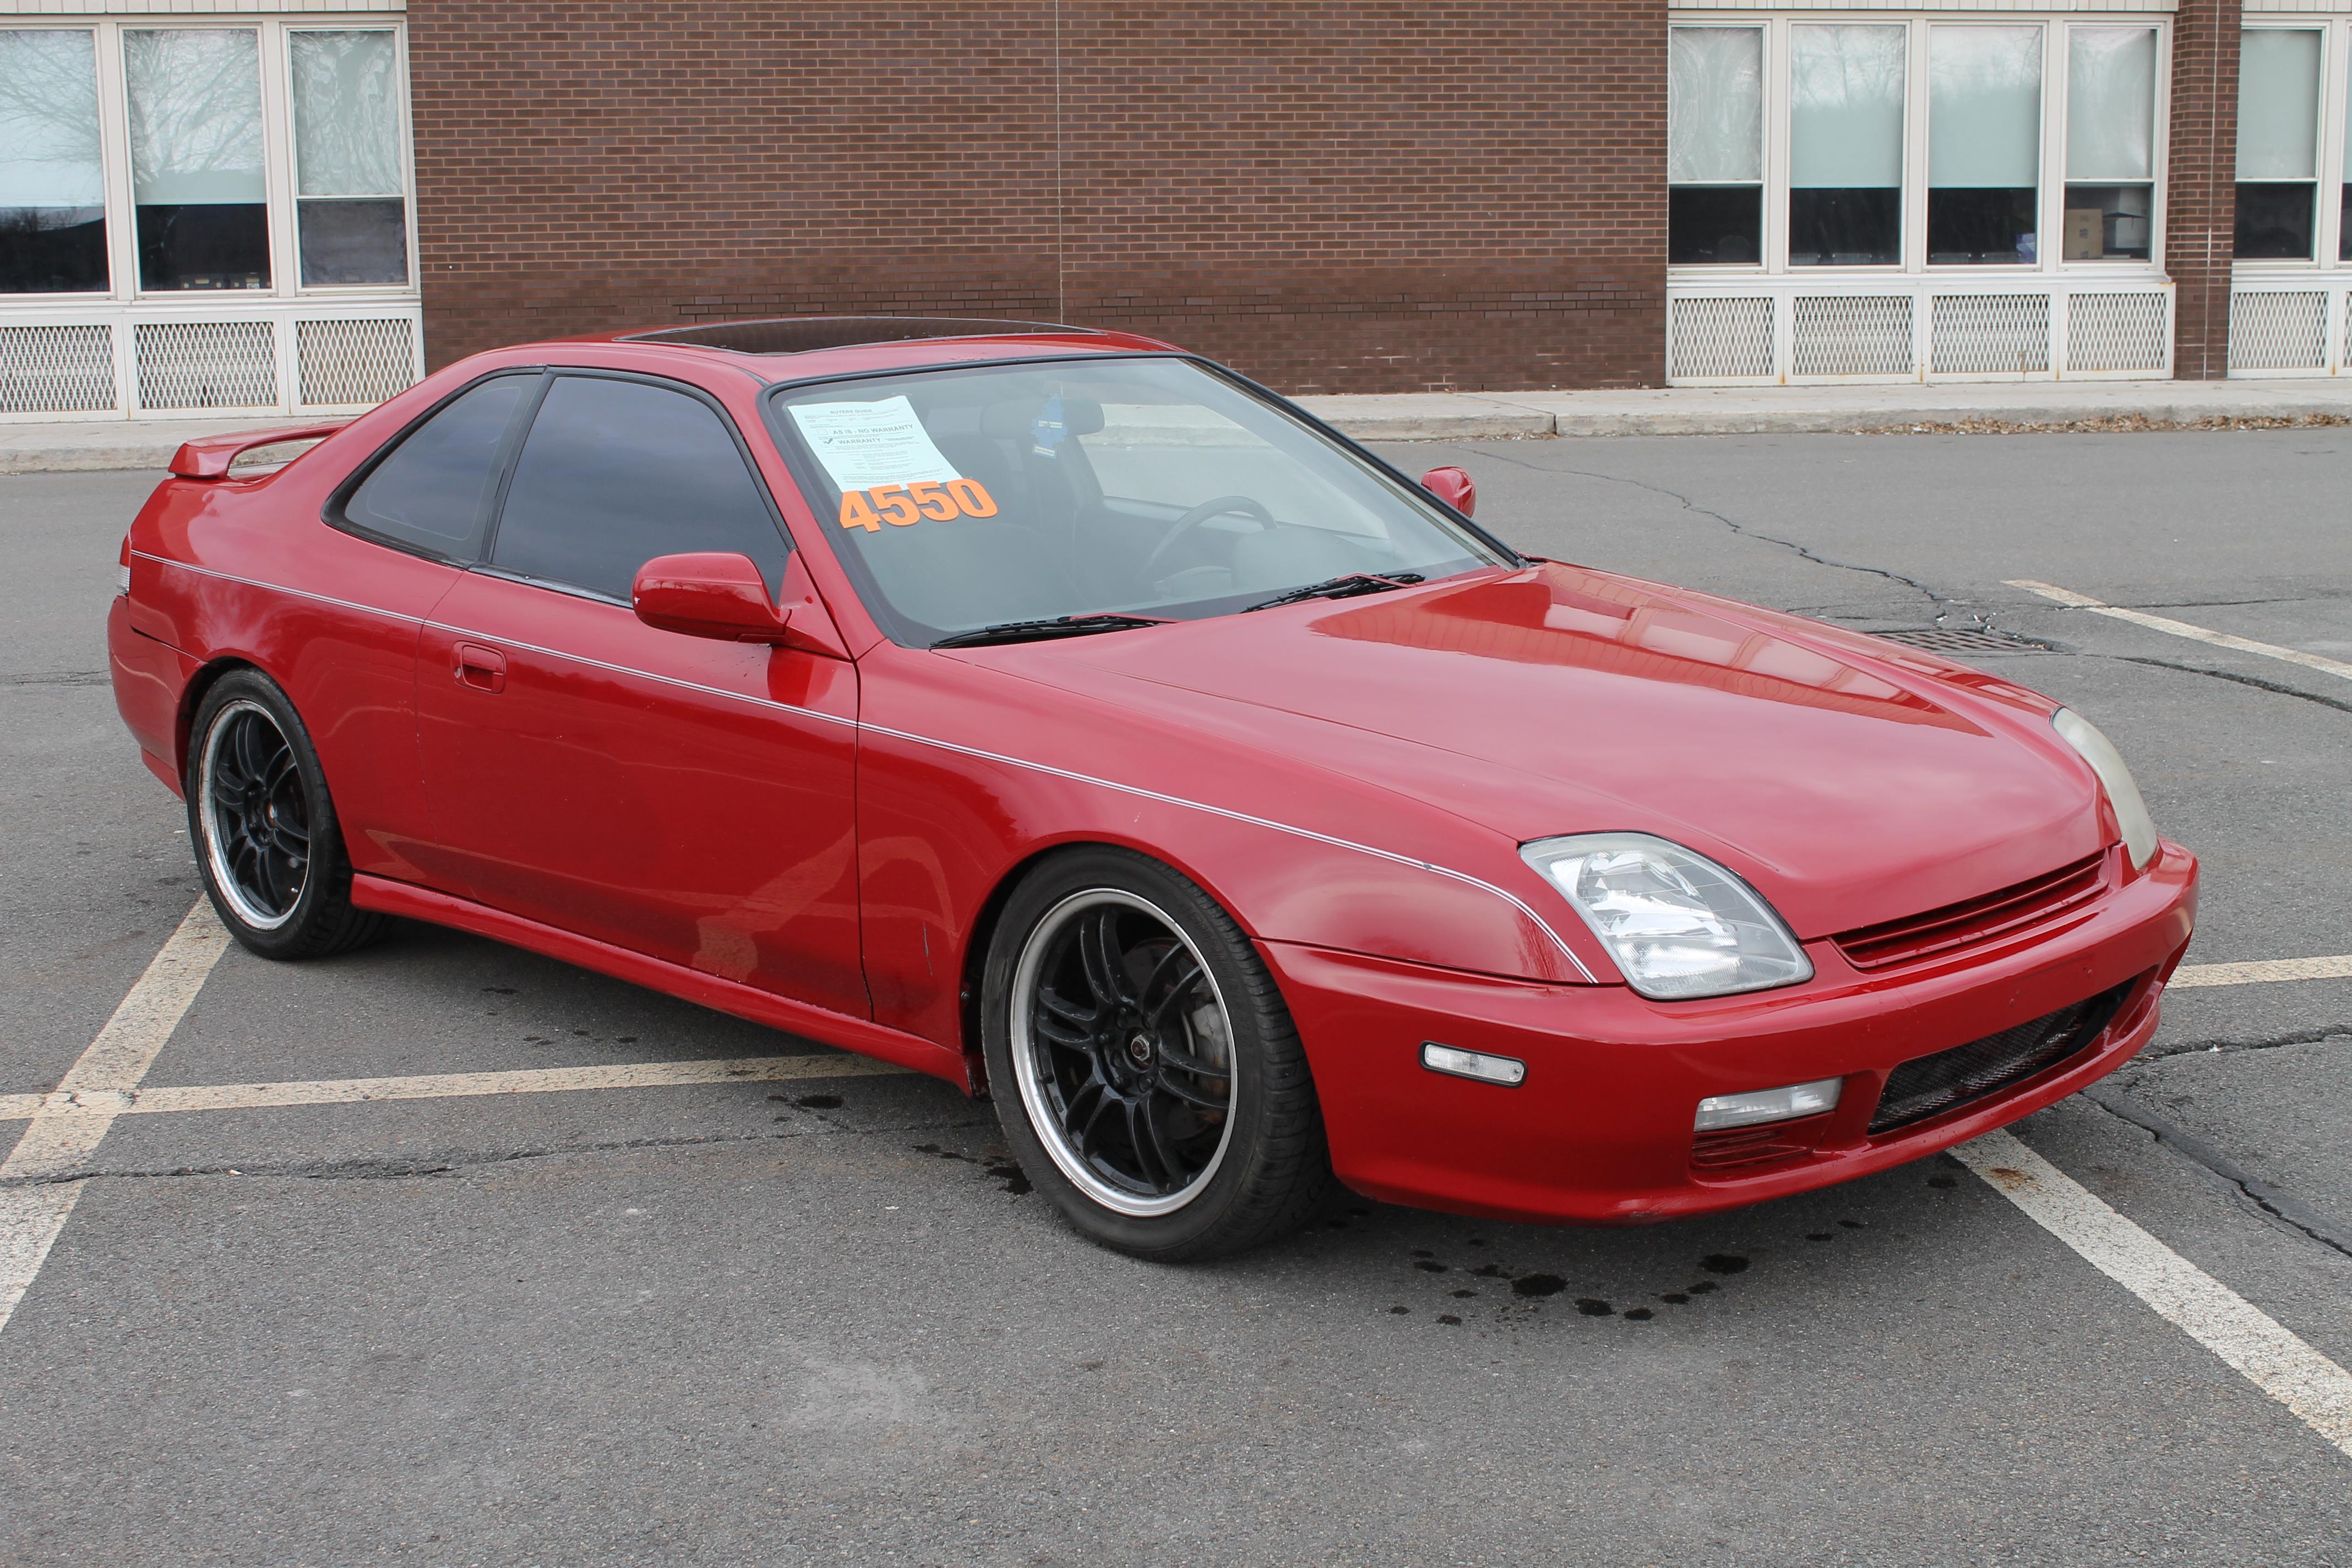 2000 honda prelude 125k miles 4 550 racelabz cars for sale lipperini sales. Black Bedroom Furniture Sets. Home Design Ideas